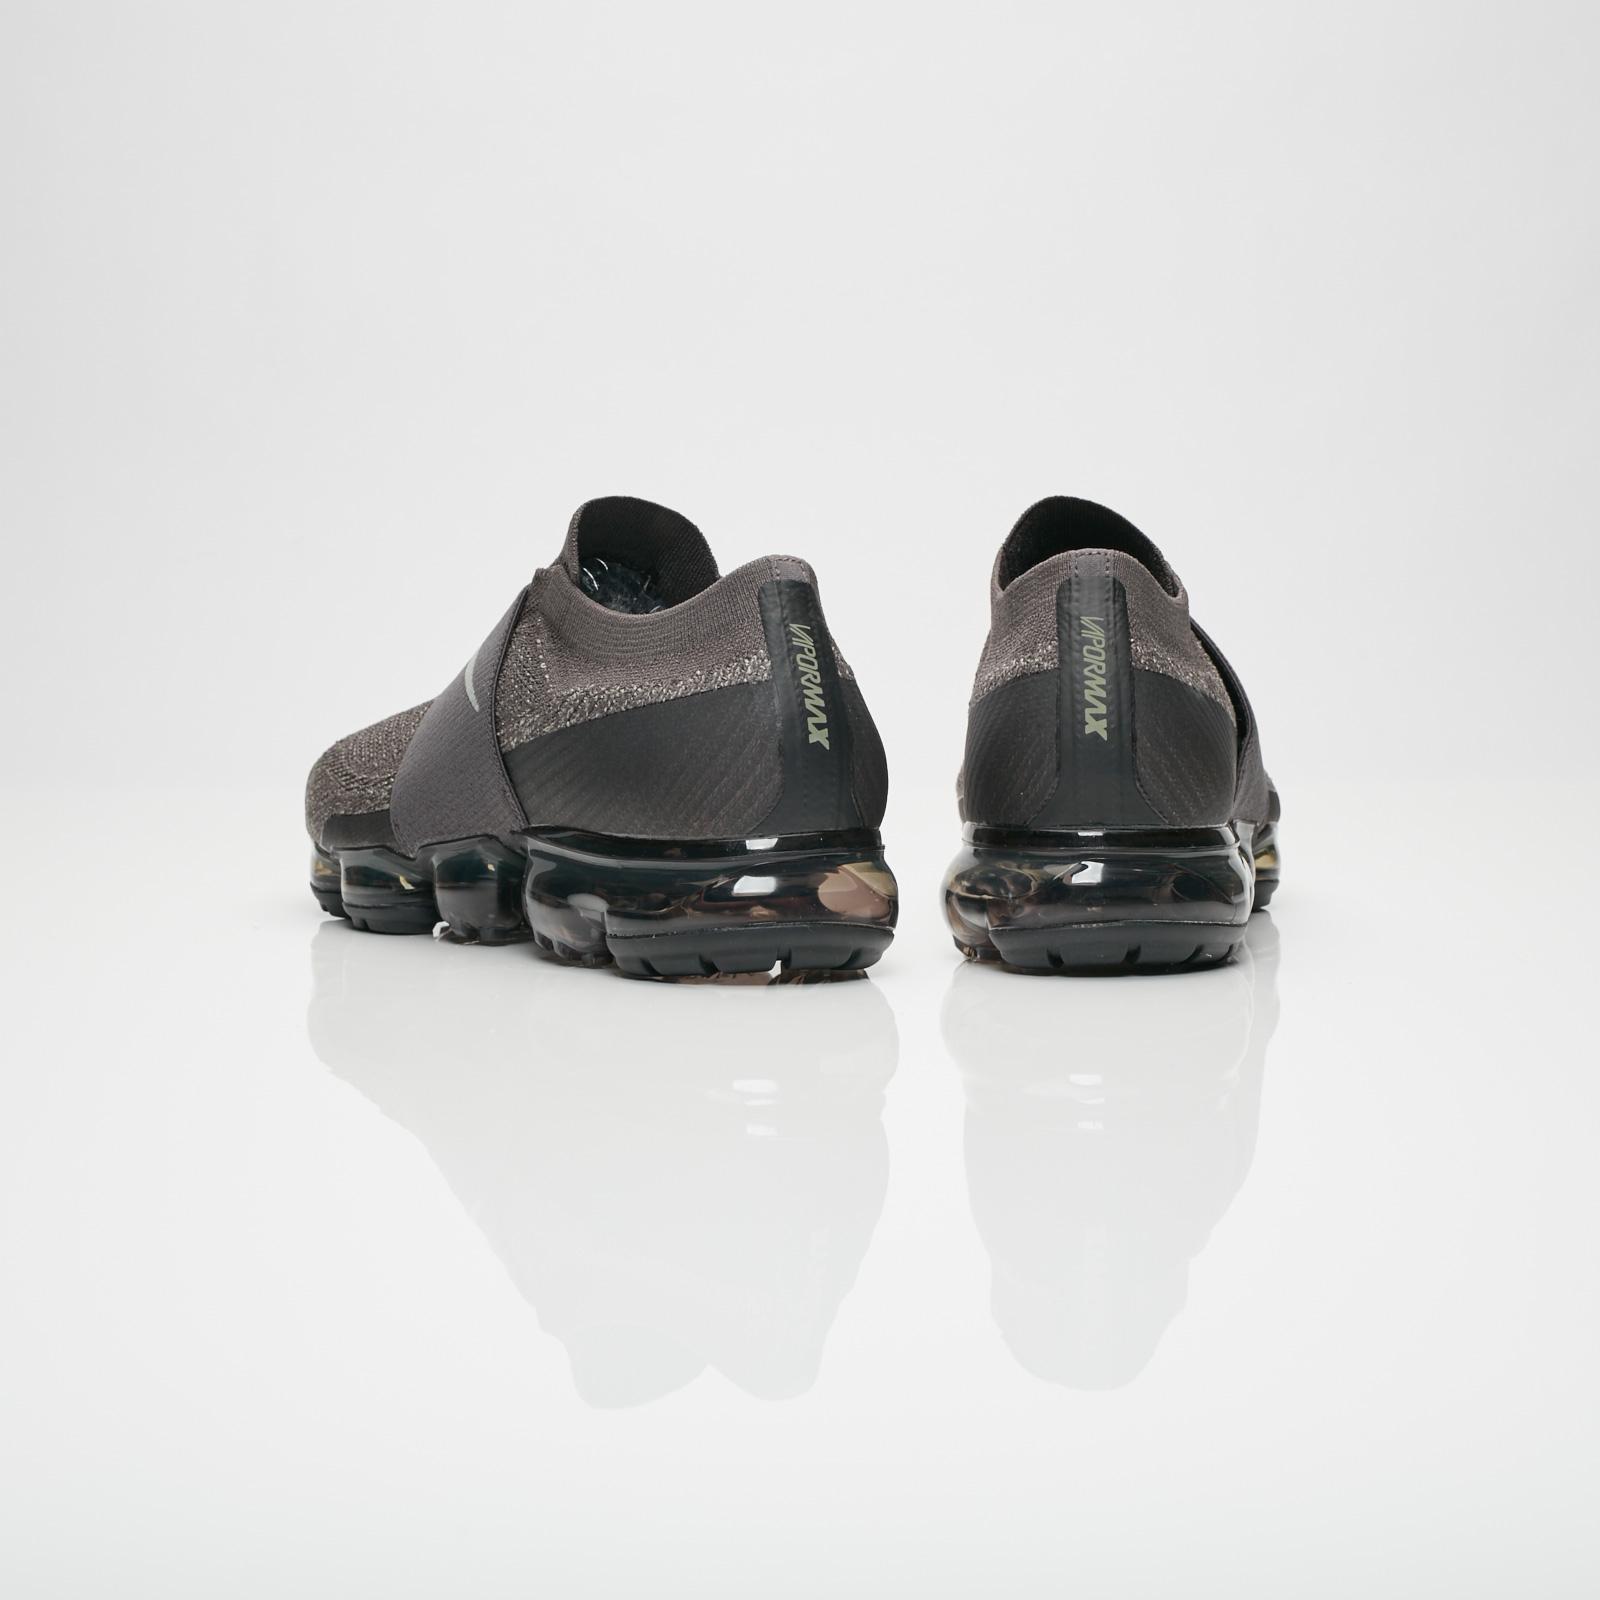 8620633381 Nike Air Vapormax Flyknit Moc - Ah3397-013 - Sneakersnstuff | sneakers &  streetwear på nätet sen 1999